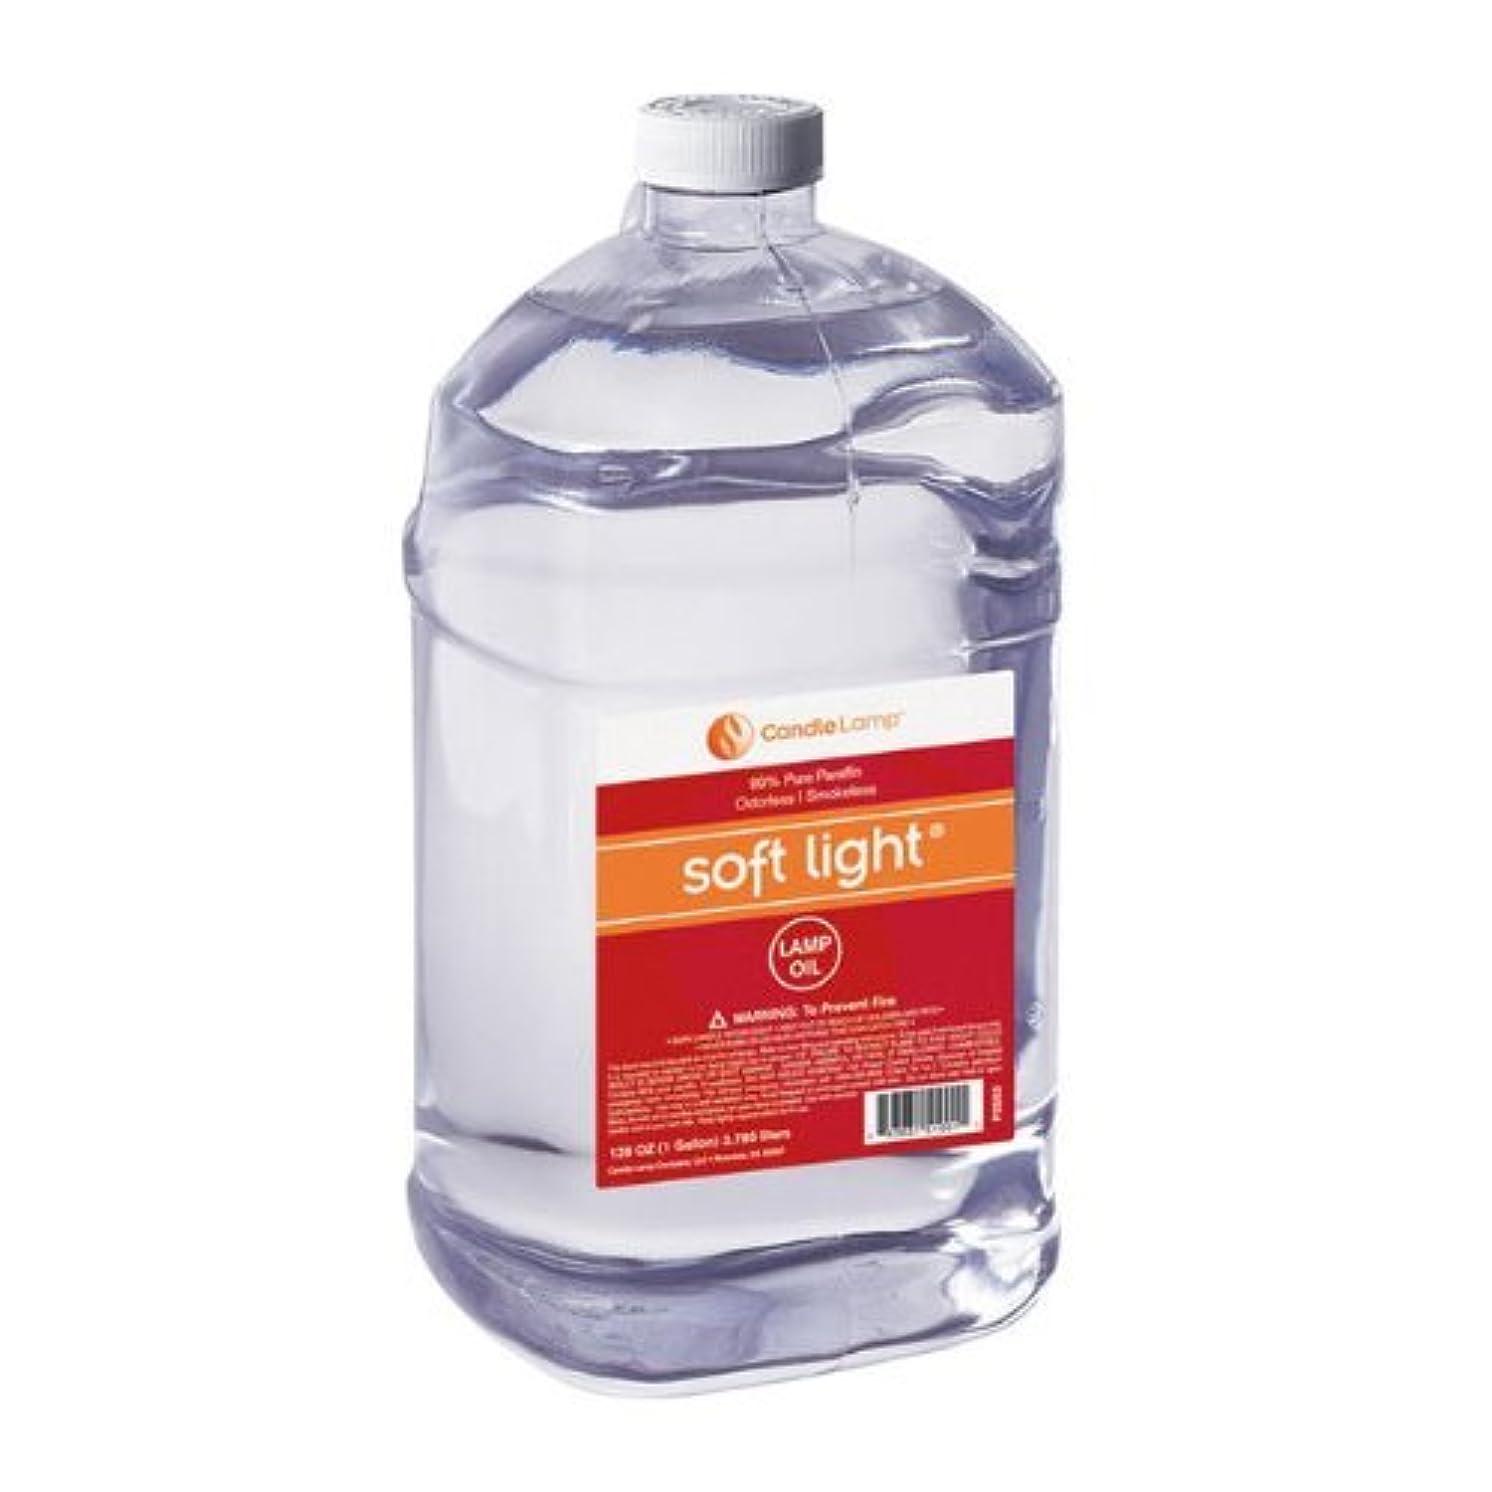 SternoCandleLamp Case of 4x1 Gallon's Smokeless Liquid Paraffin Lamp Oil